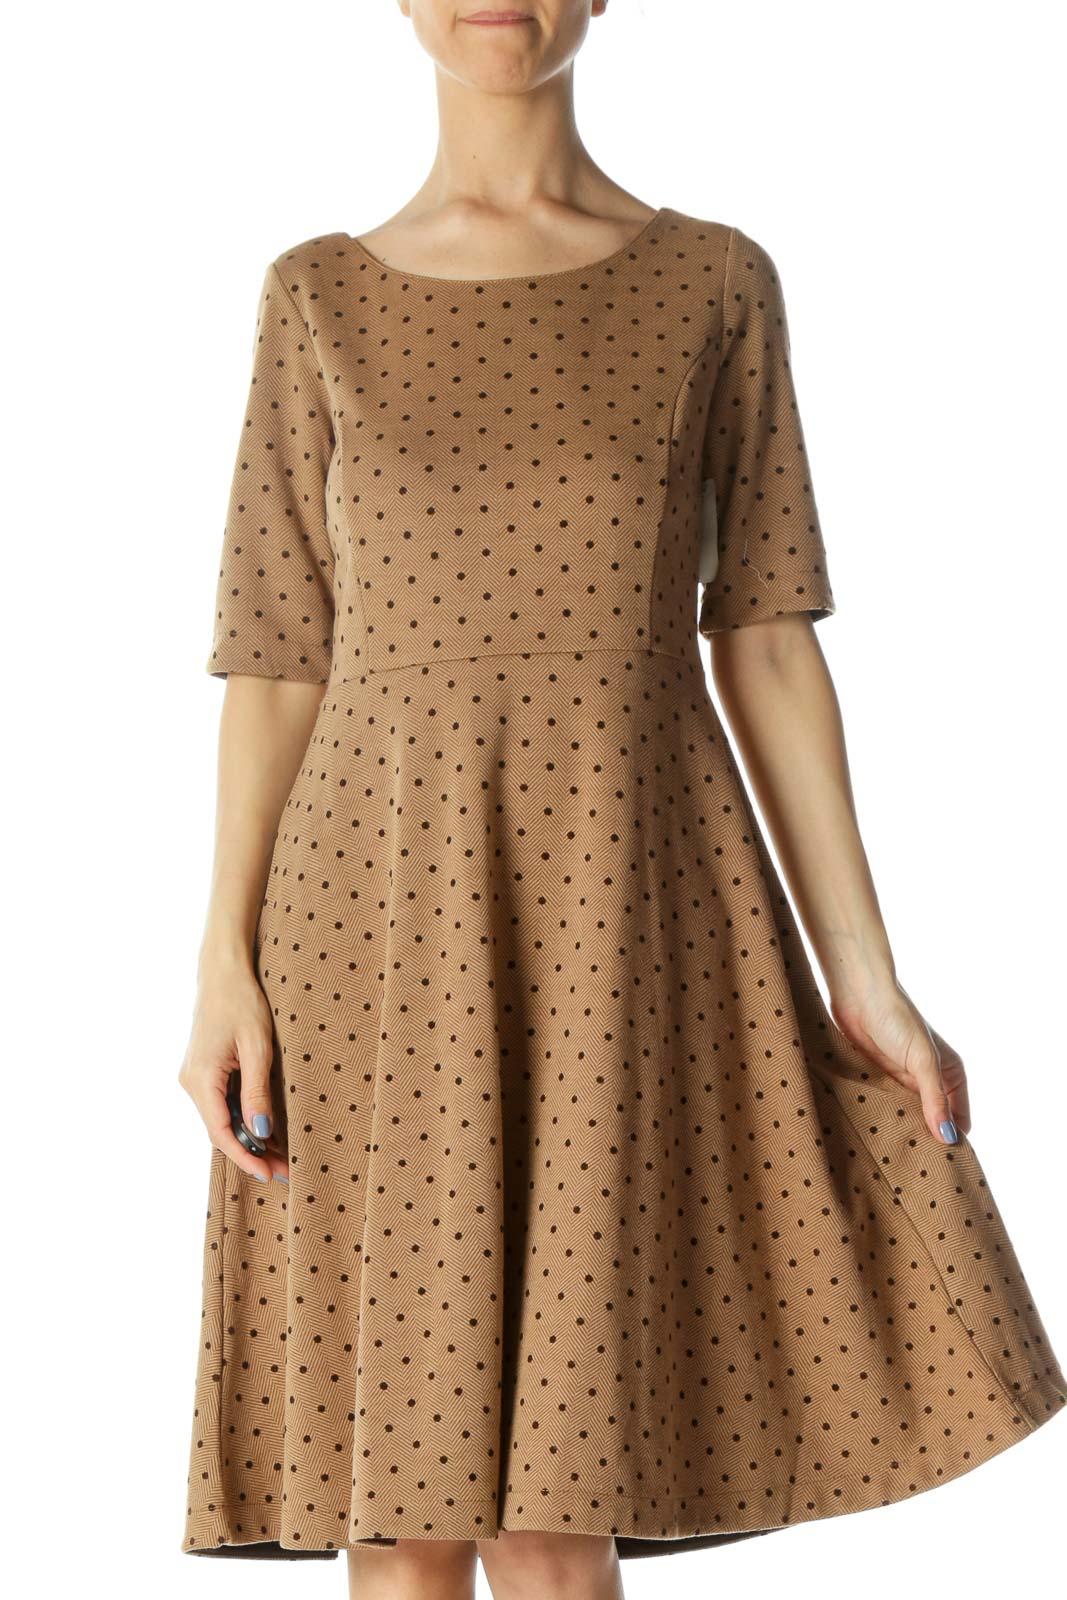 Brown Herringbone 3/4-Sleeve Textured Skater Dress Front